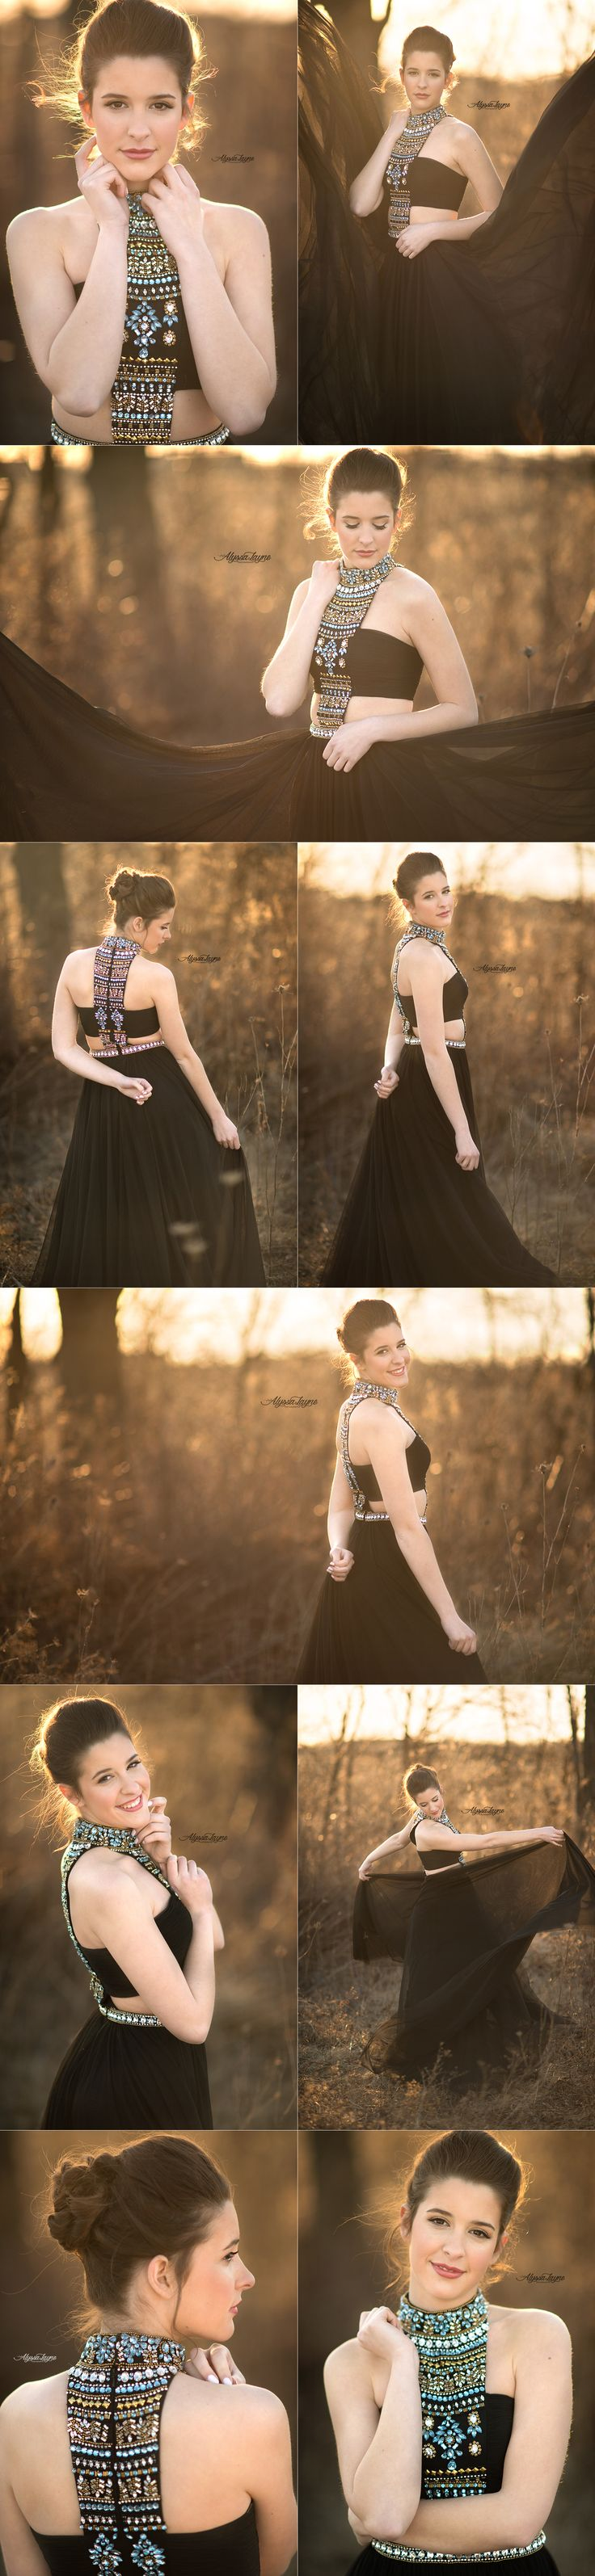 Alyssa Layne Photography | Senior Pictures | Senior Photographer | Illinois Senior Photographer | Posing Ideas | Senior Pose | Posing | Prom